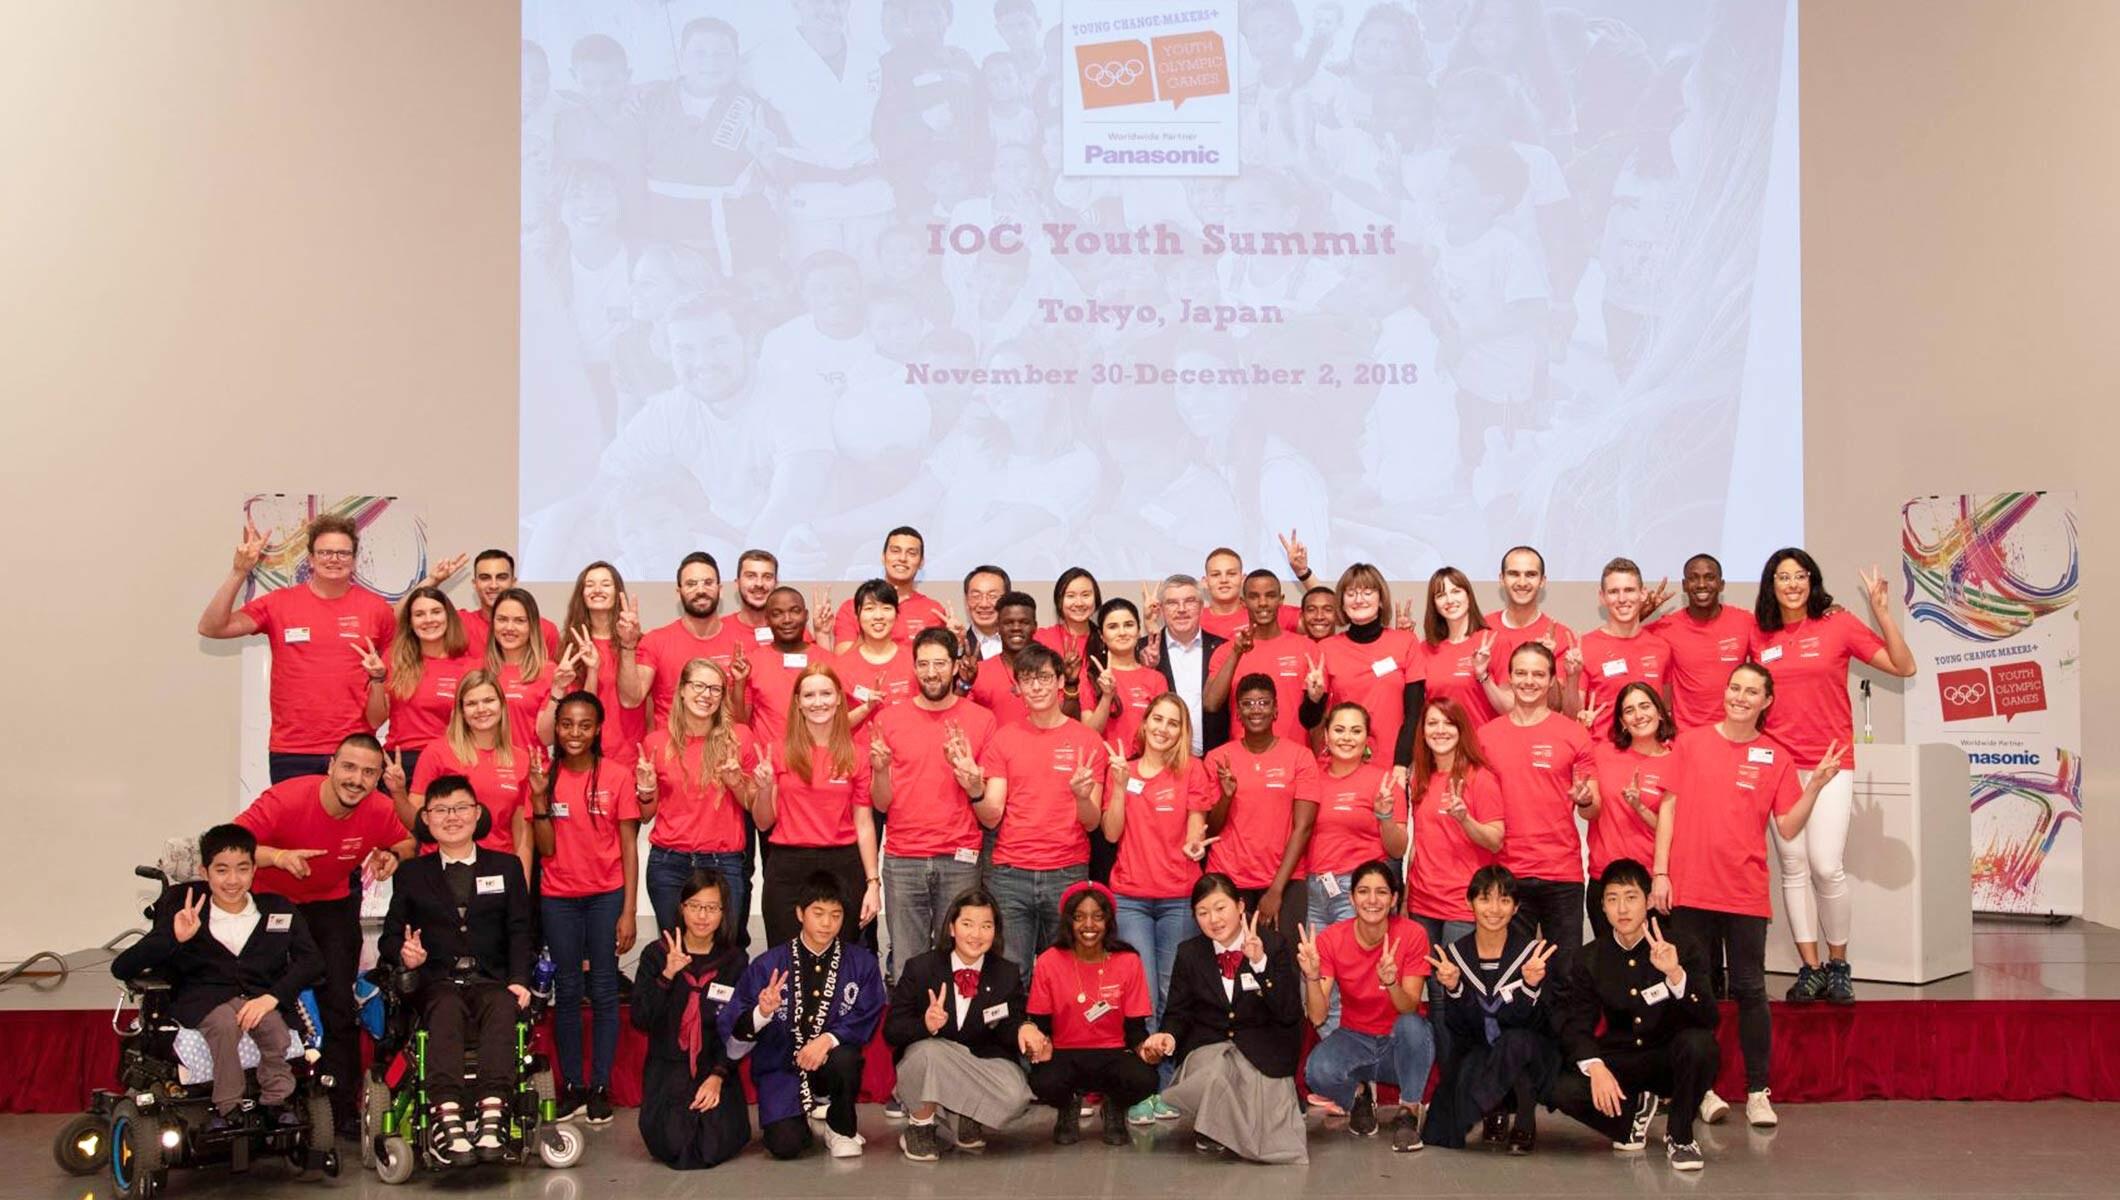 IOC Young Leaders Panasonic